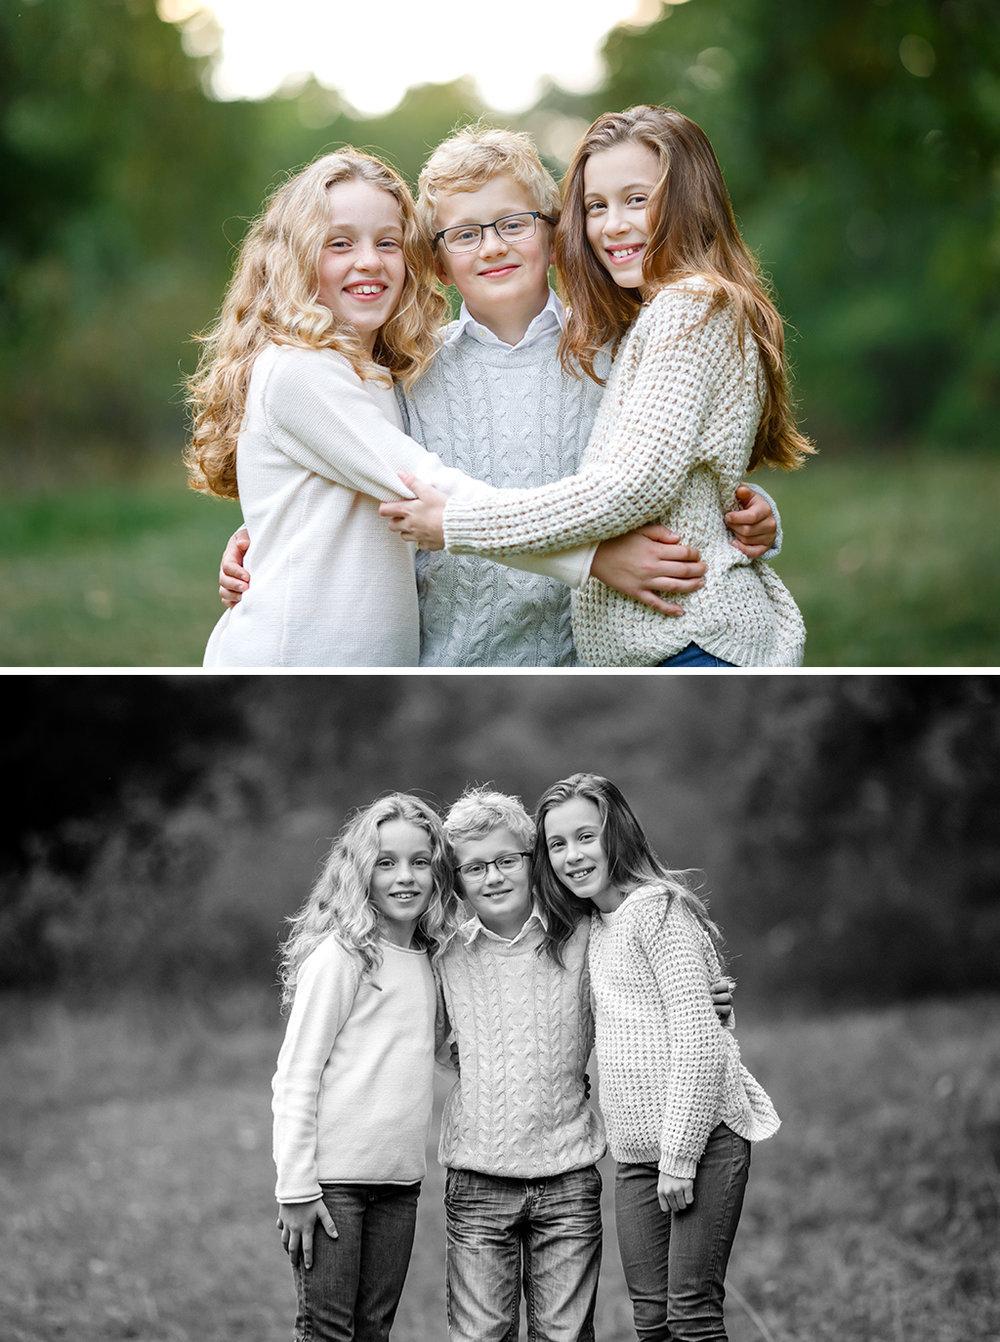 Familjefotografering_i-Stockholm_Lifestyle-familjefotograf-Anna-Sandstrom_15.jpg